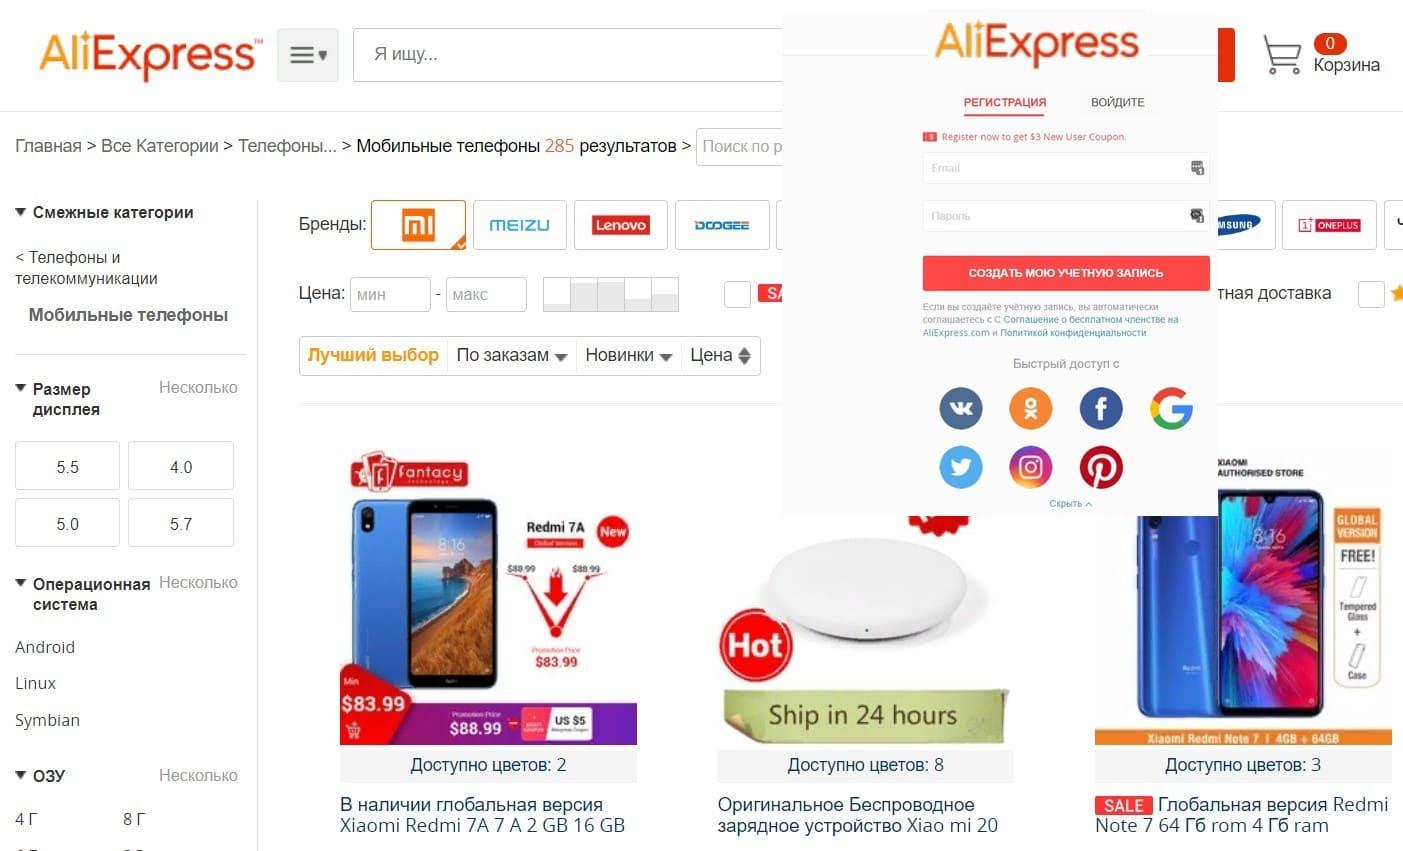 Алиэкспресс сайт на русском